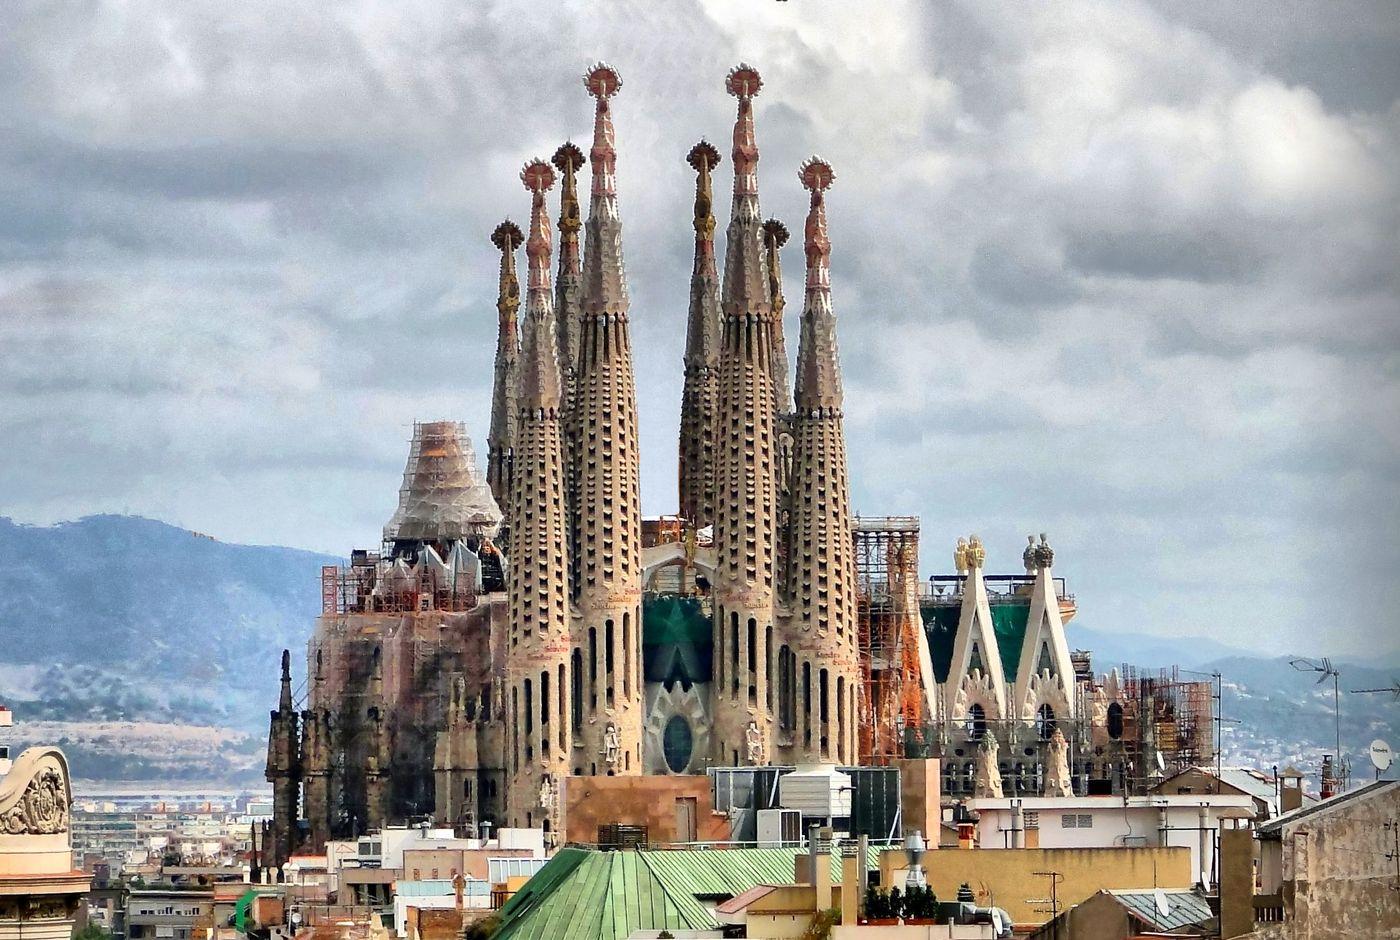 La sagrada familia imprescindibles en barcelona for De la sagrada familia